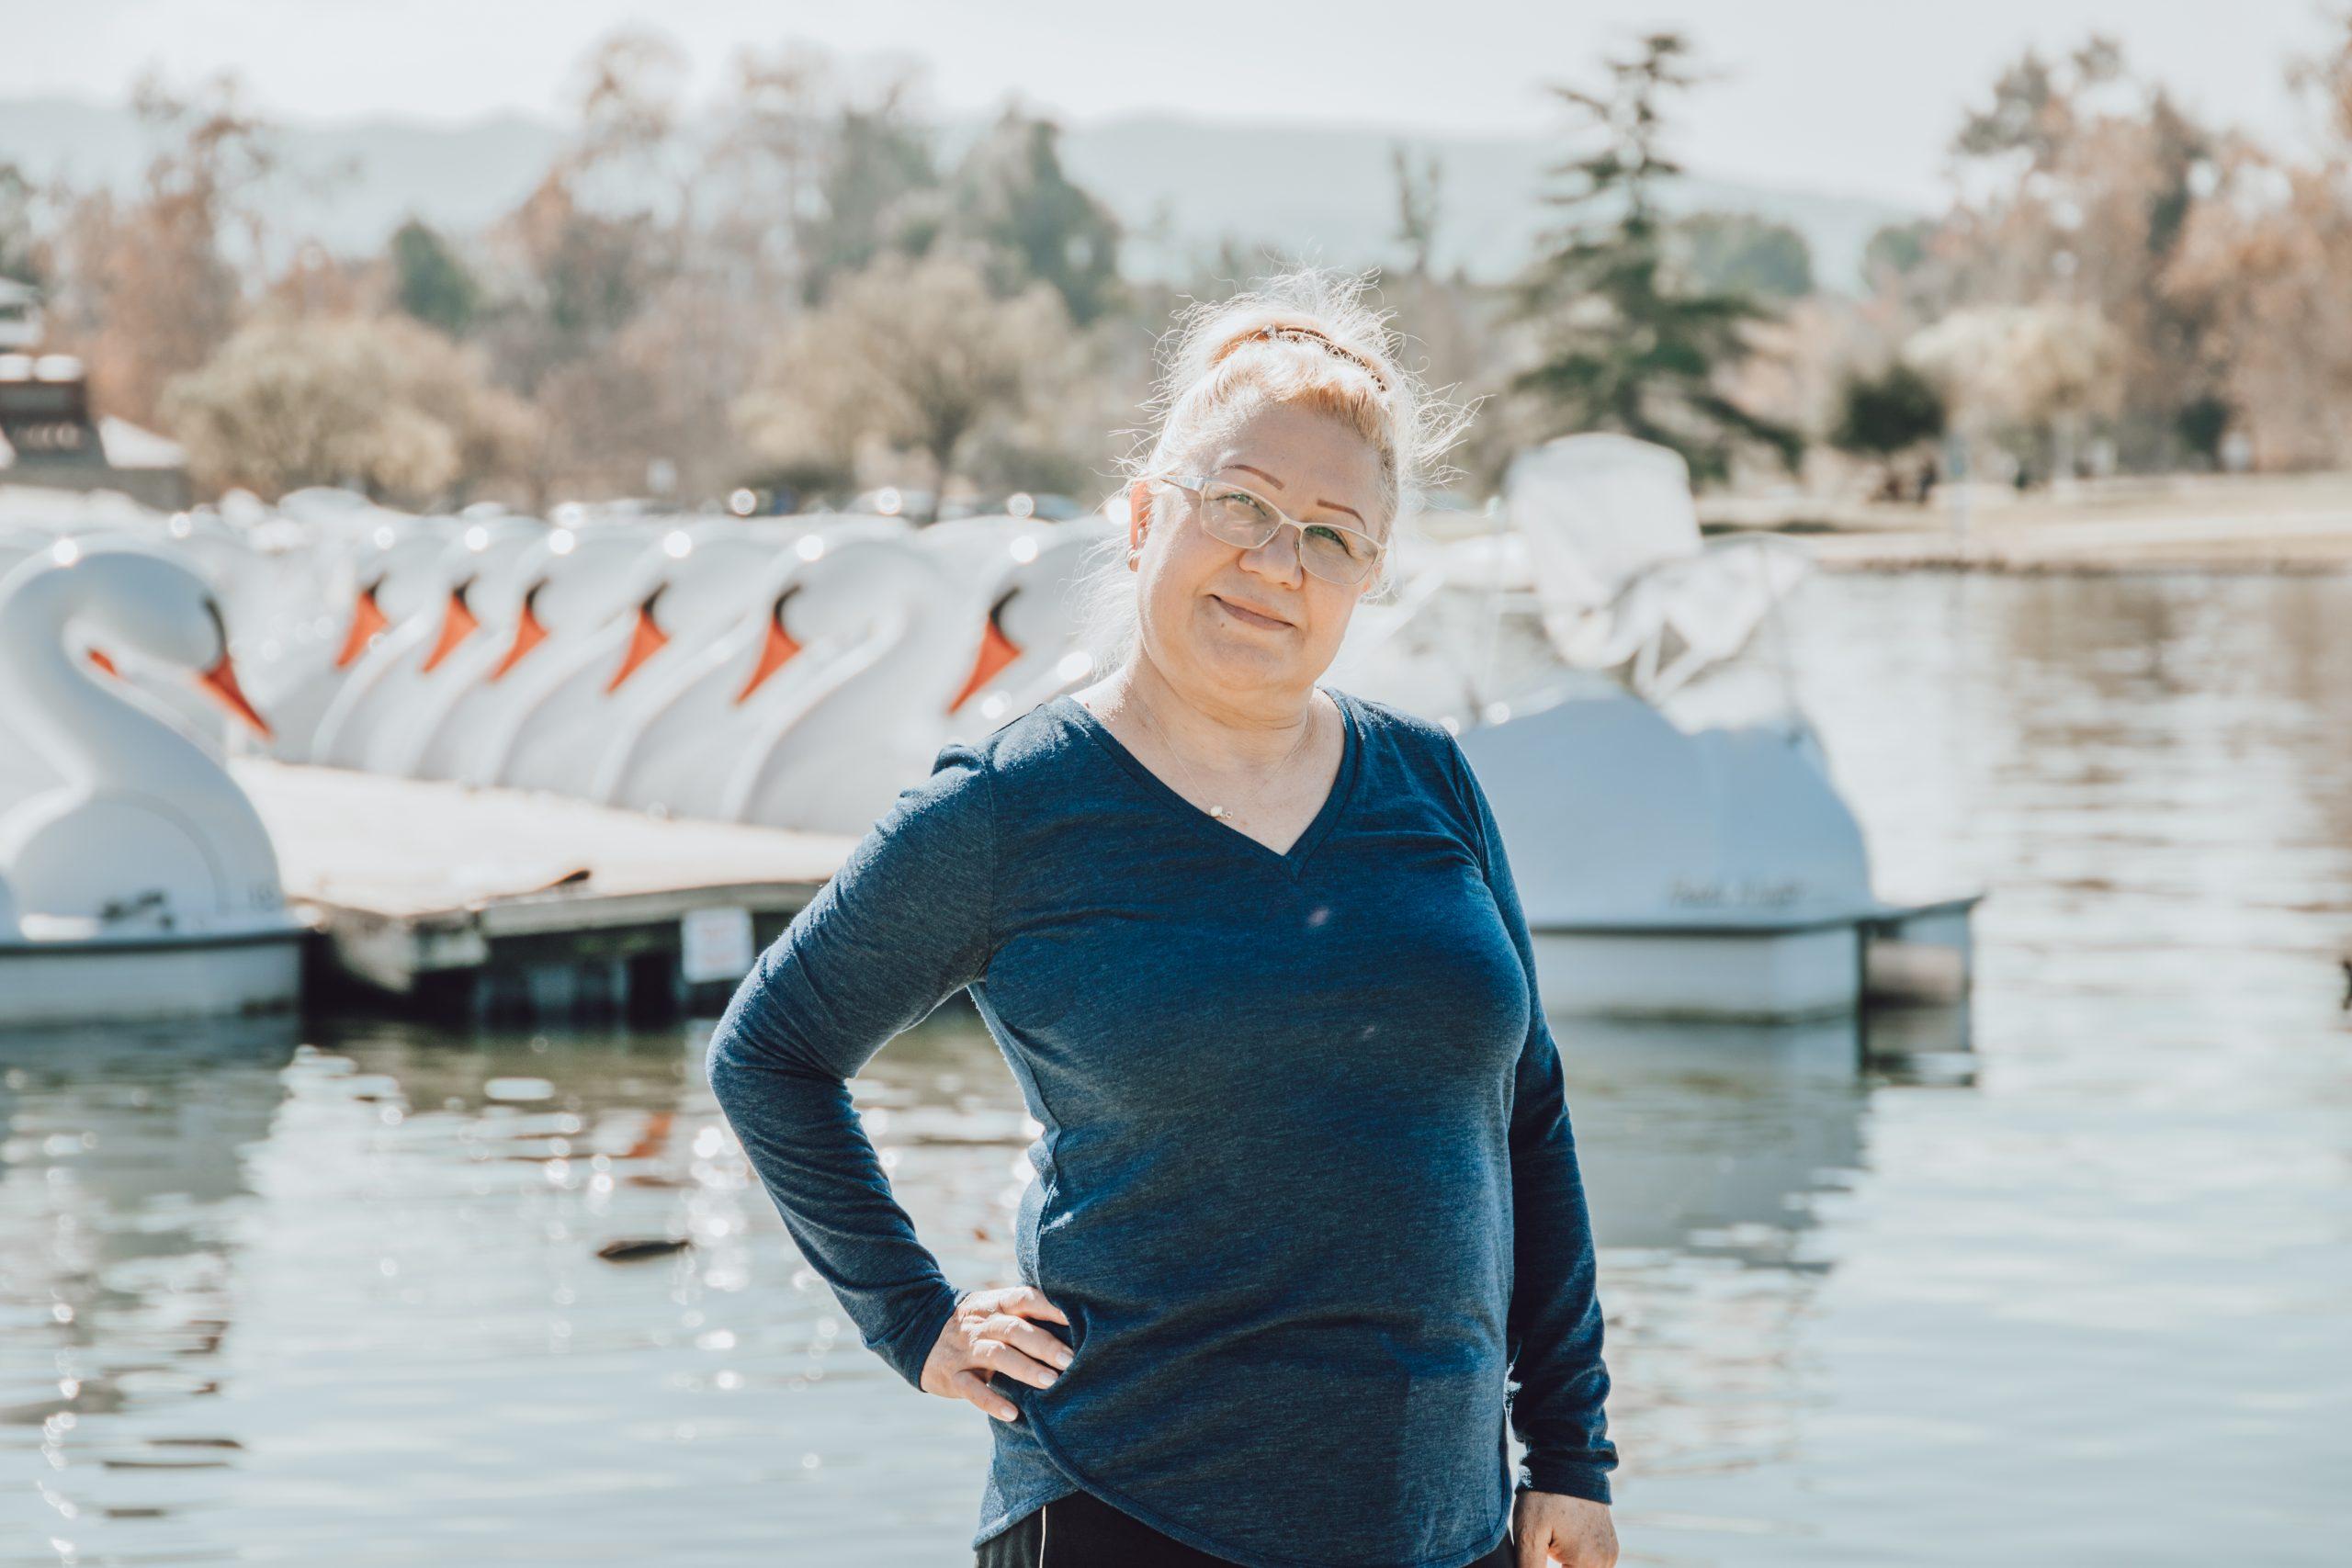 lake balboa portrait photography